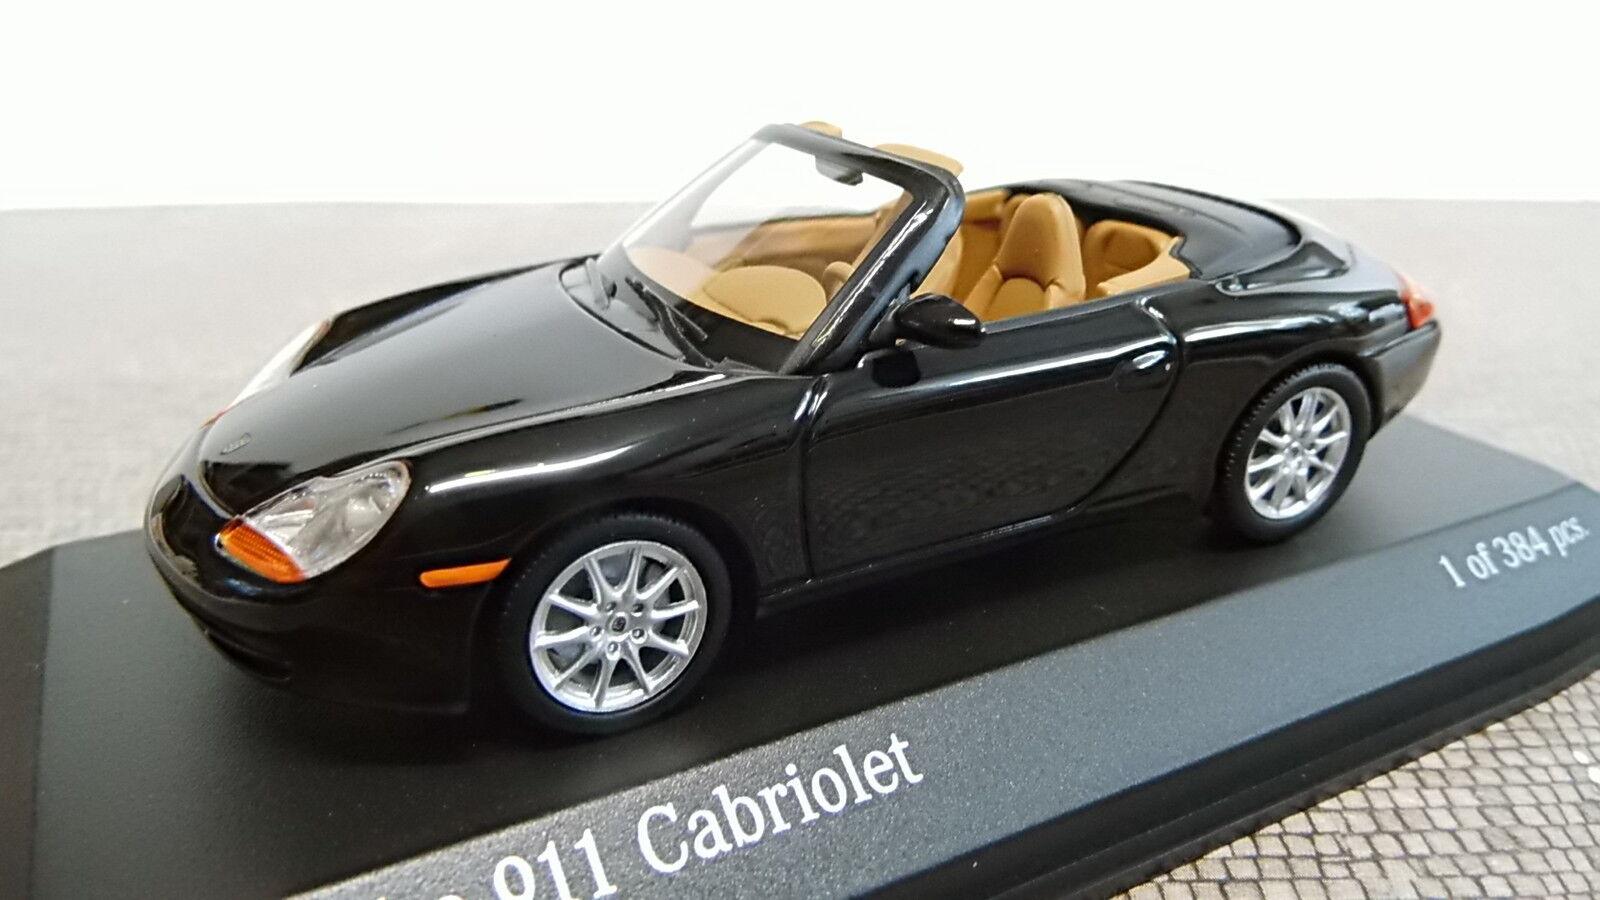 Minichamps 1 43 Porsche 911 converdeible 1998 negro negro negro 400061090 nuevo embalaje original f64f5c